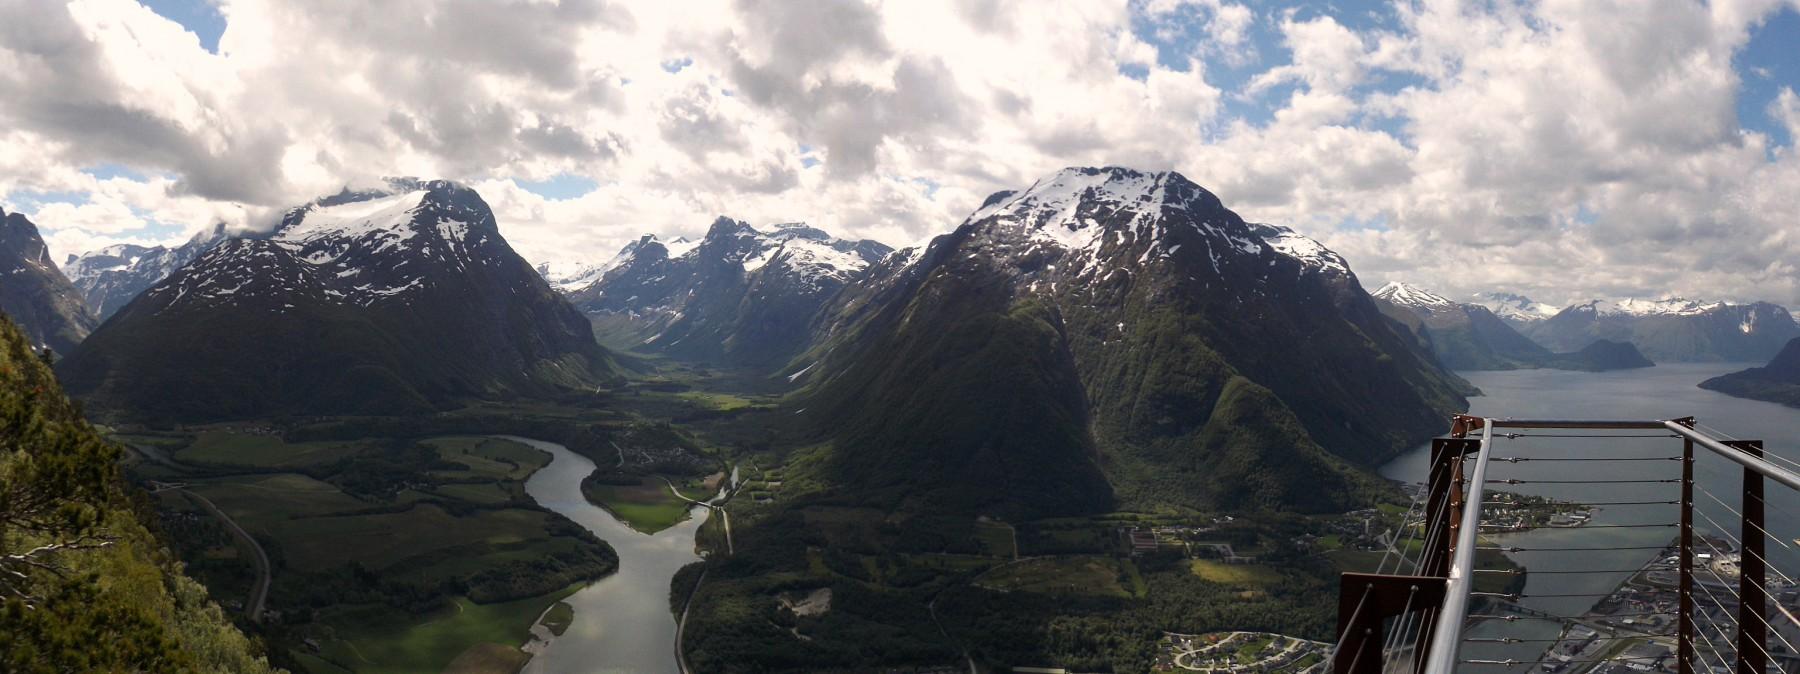 Romsdal-lépcső